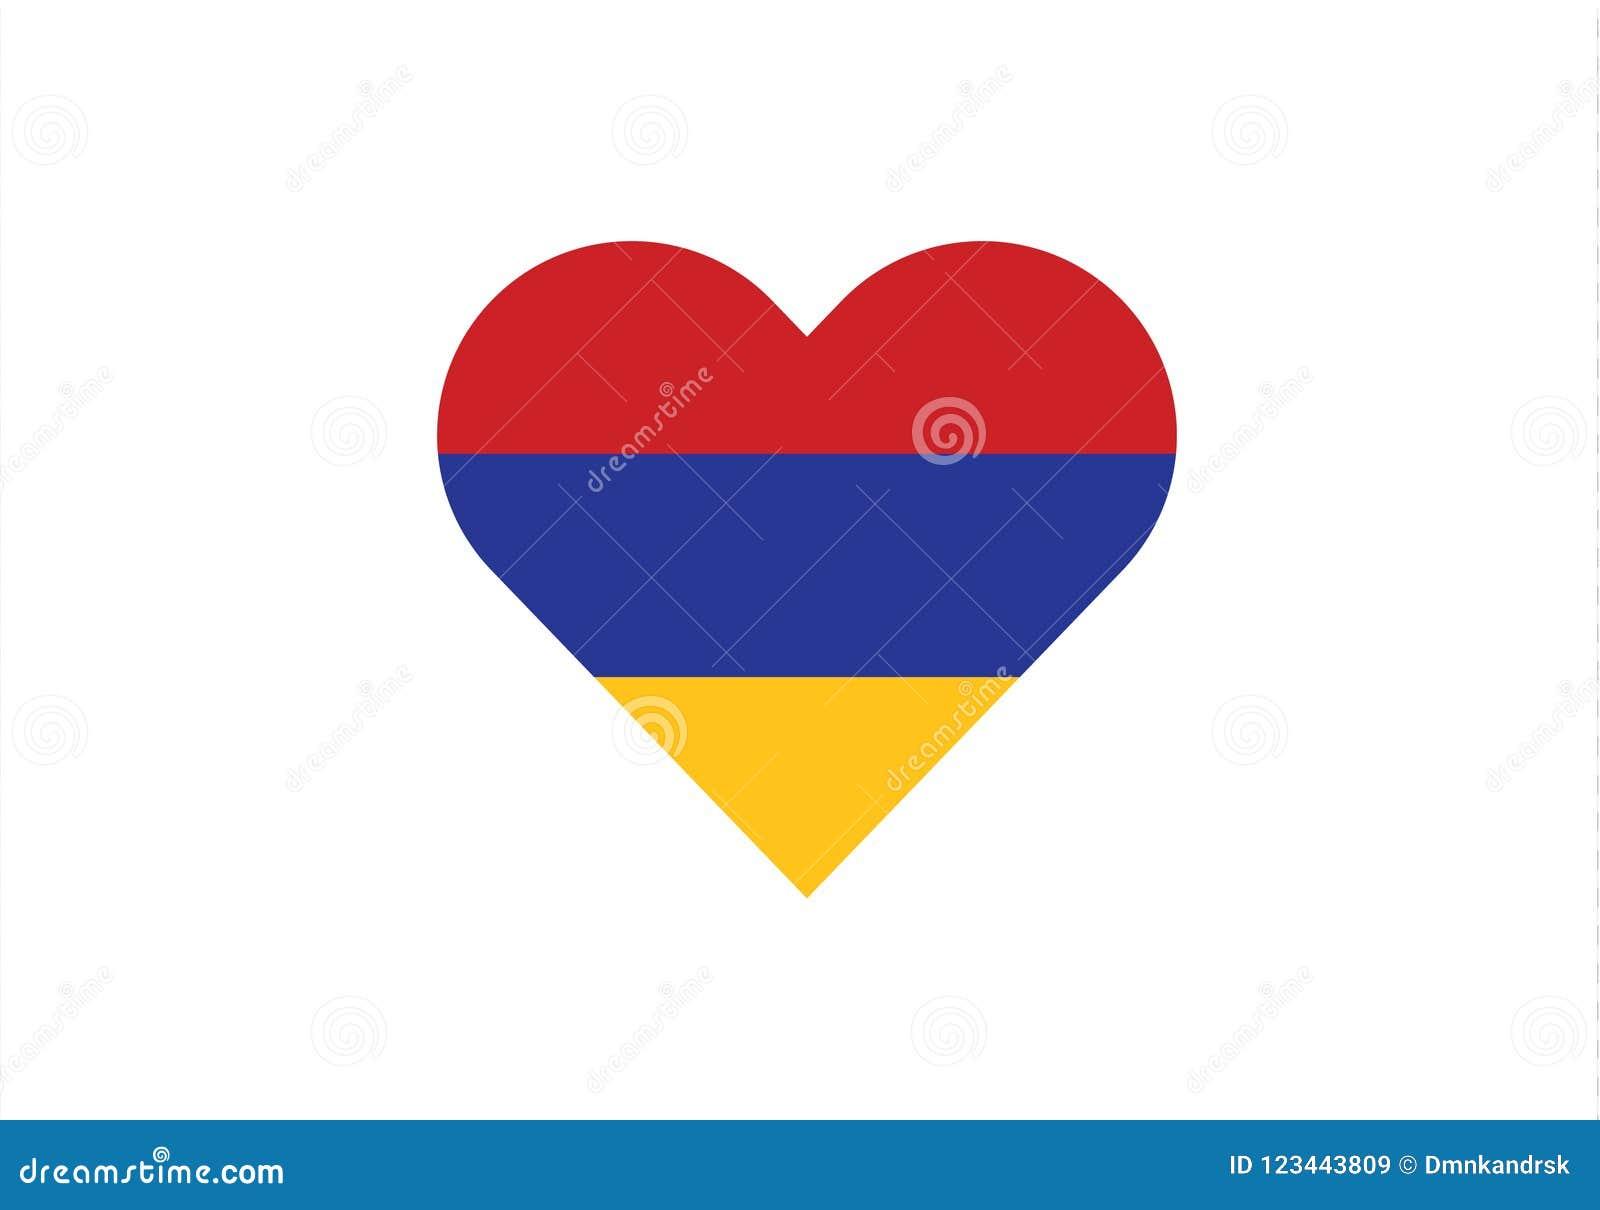 Armenia love heart shape country